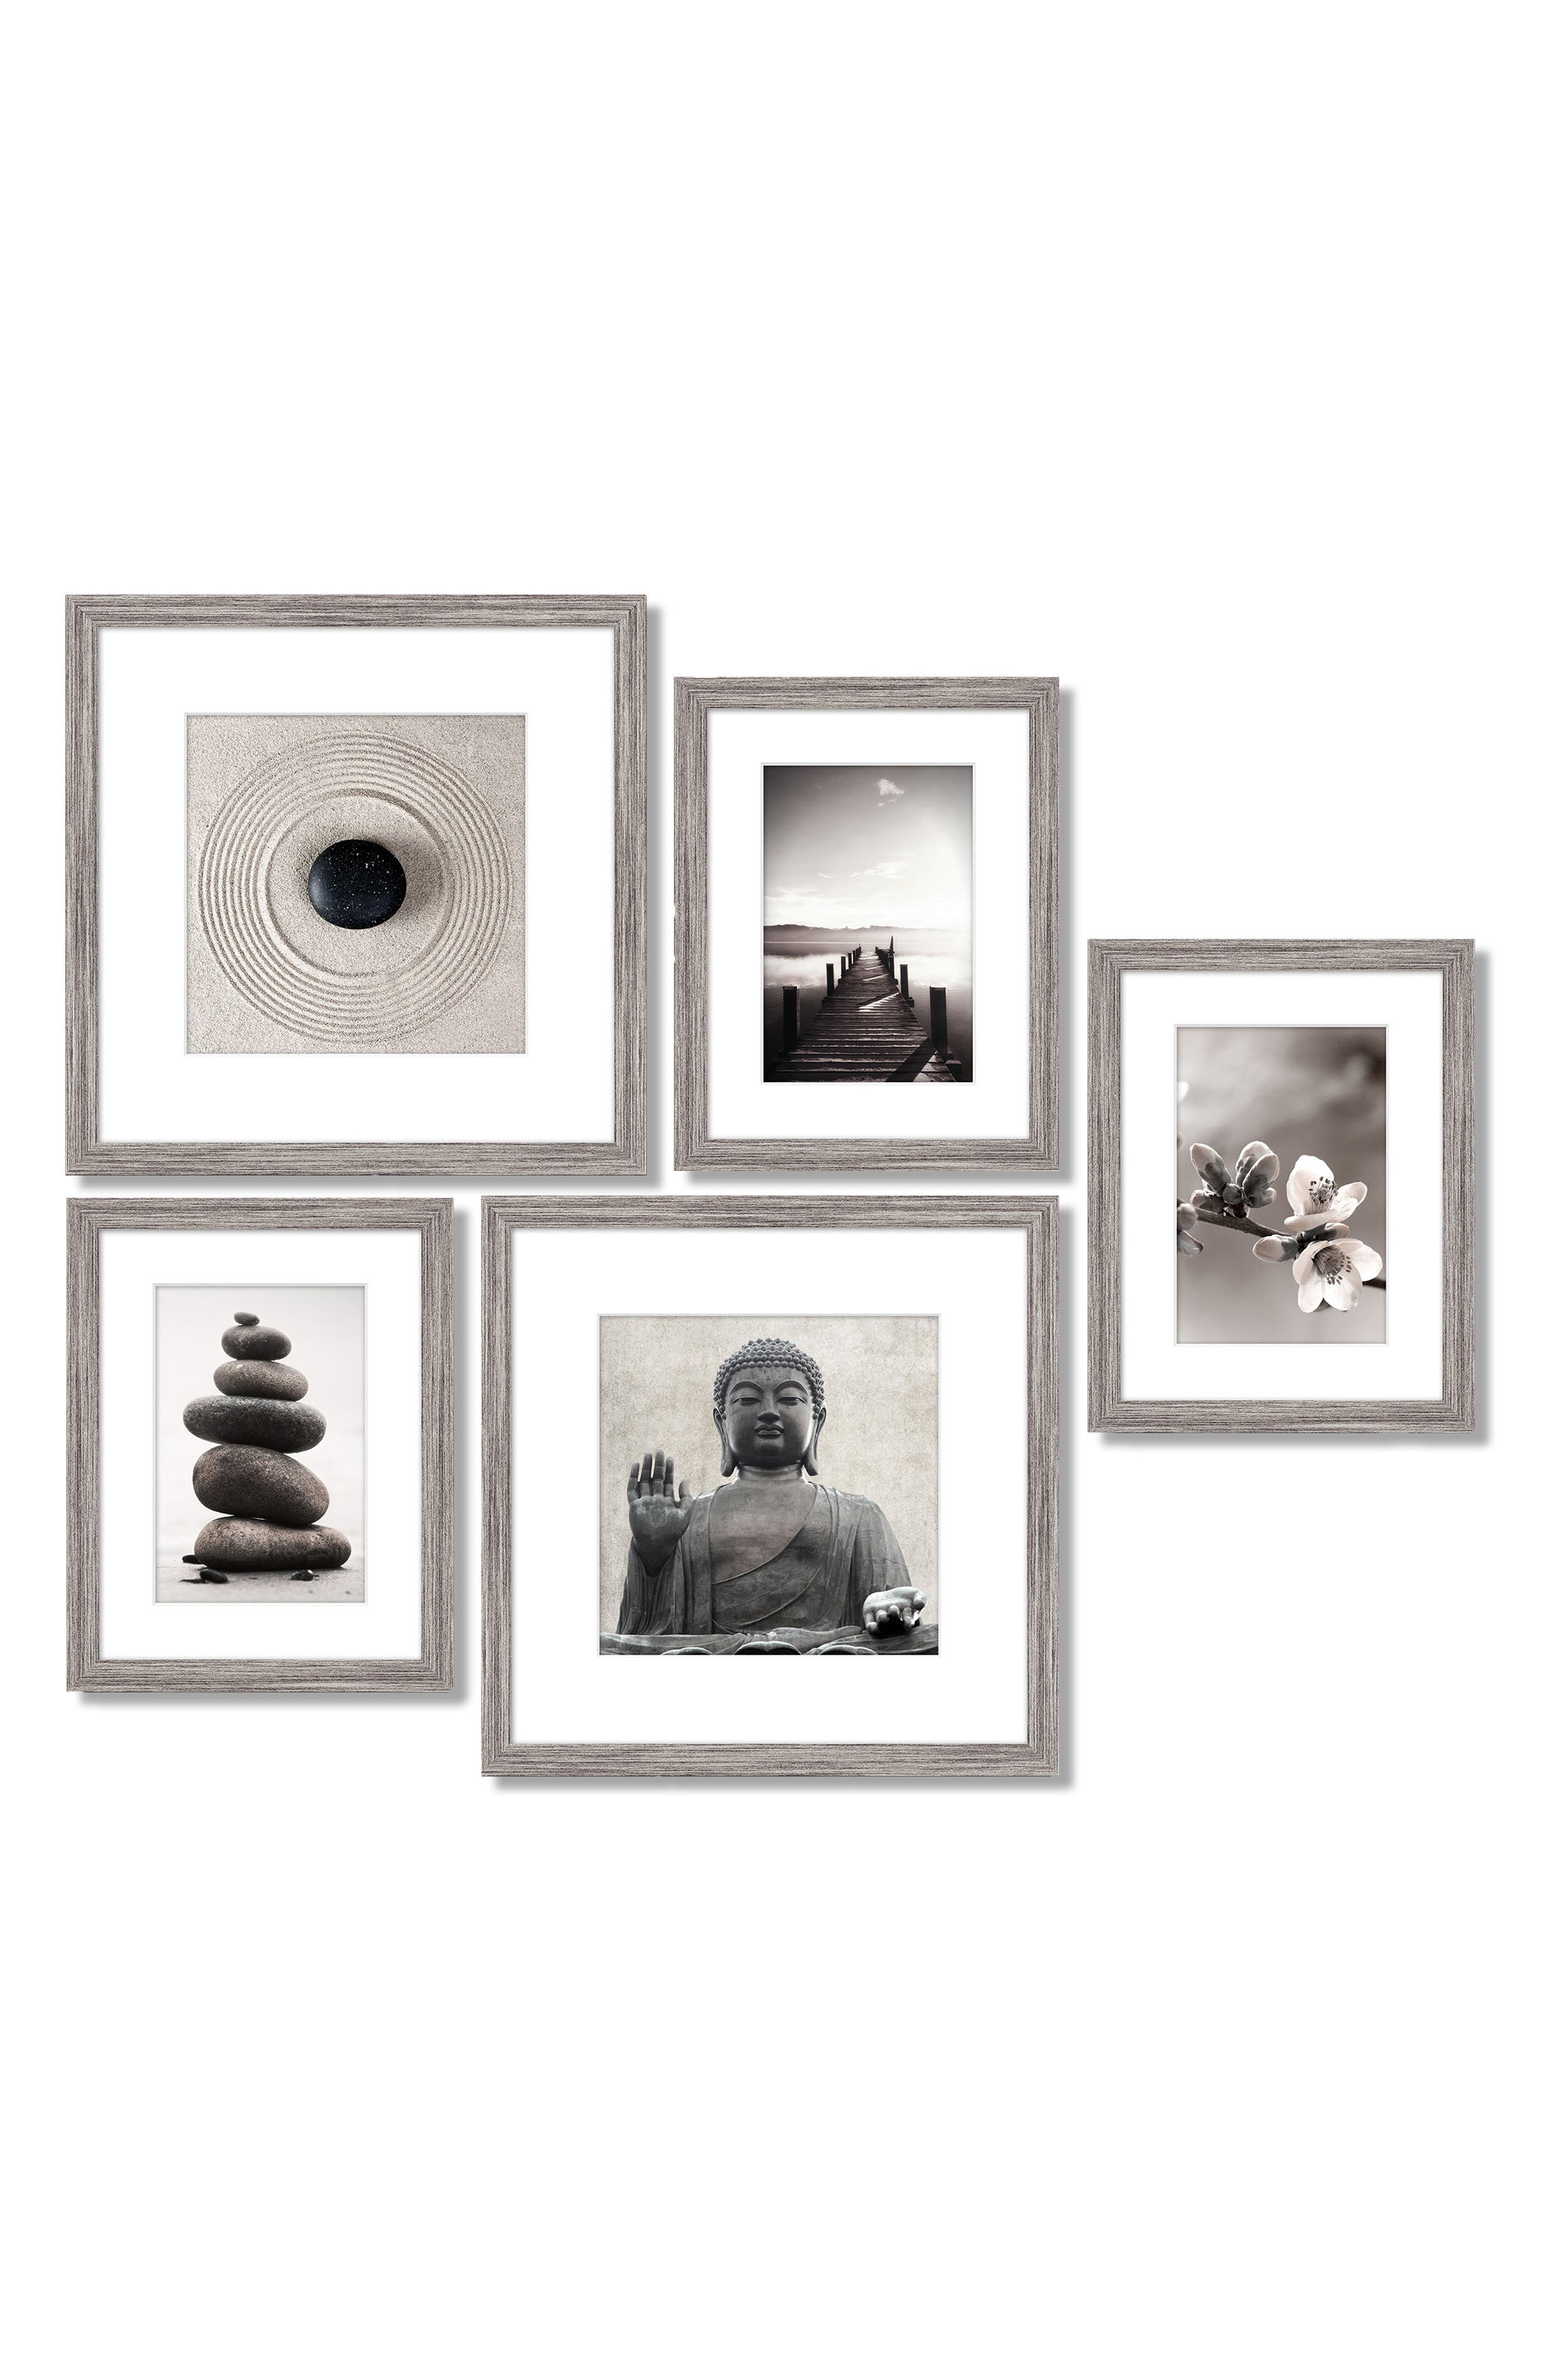 Crystal Art Gallery 5-Piece Framed Wall Art Gallery